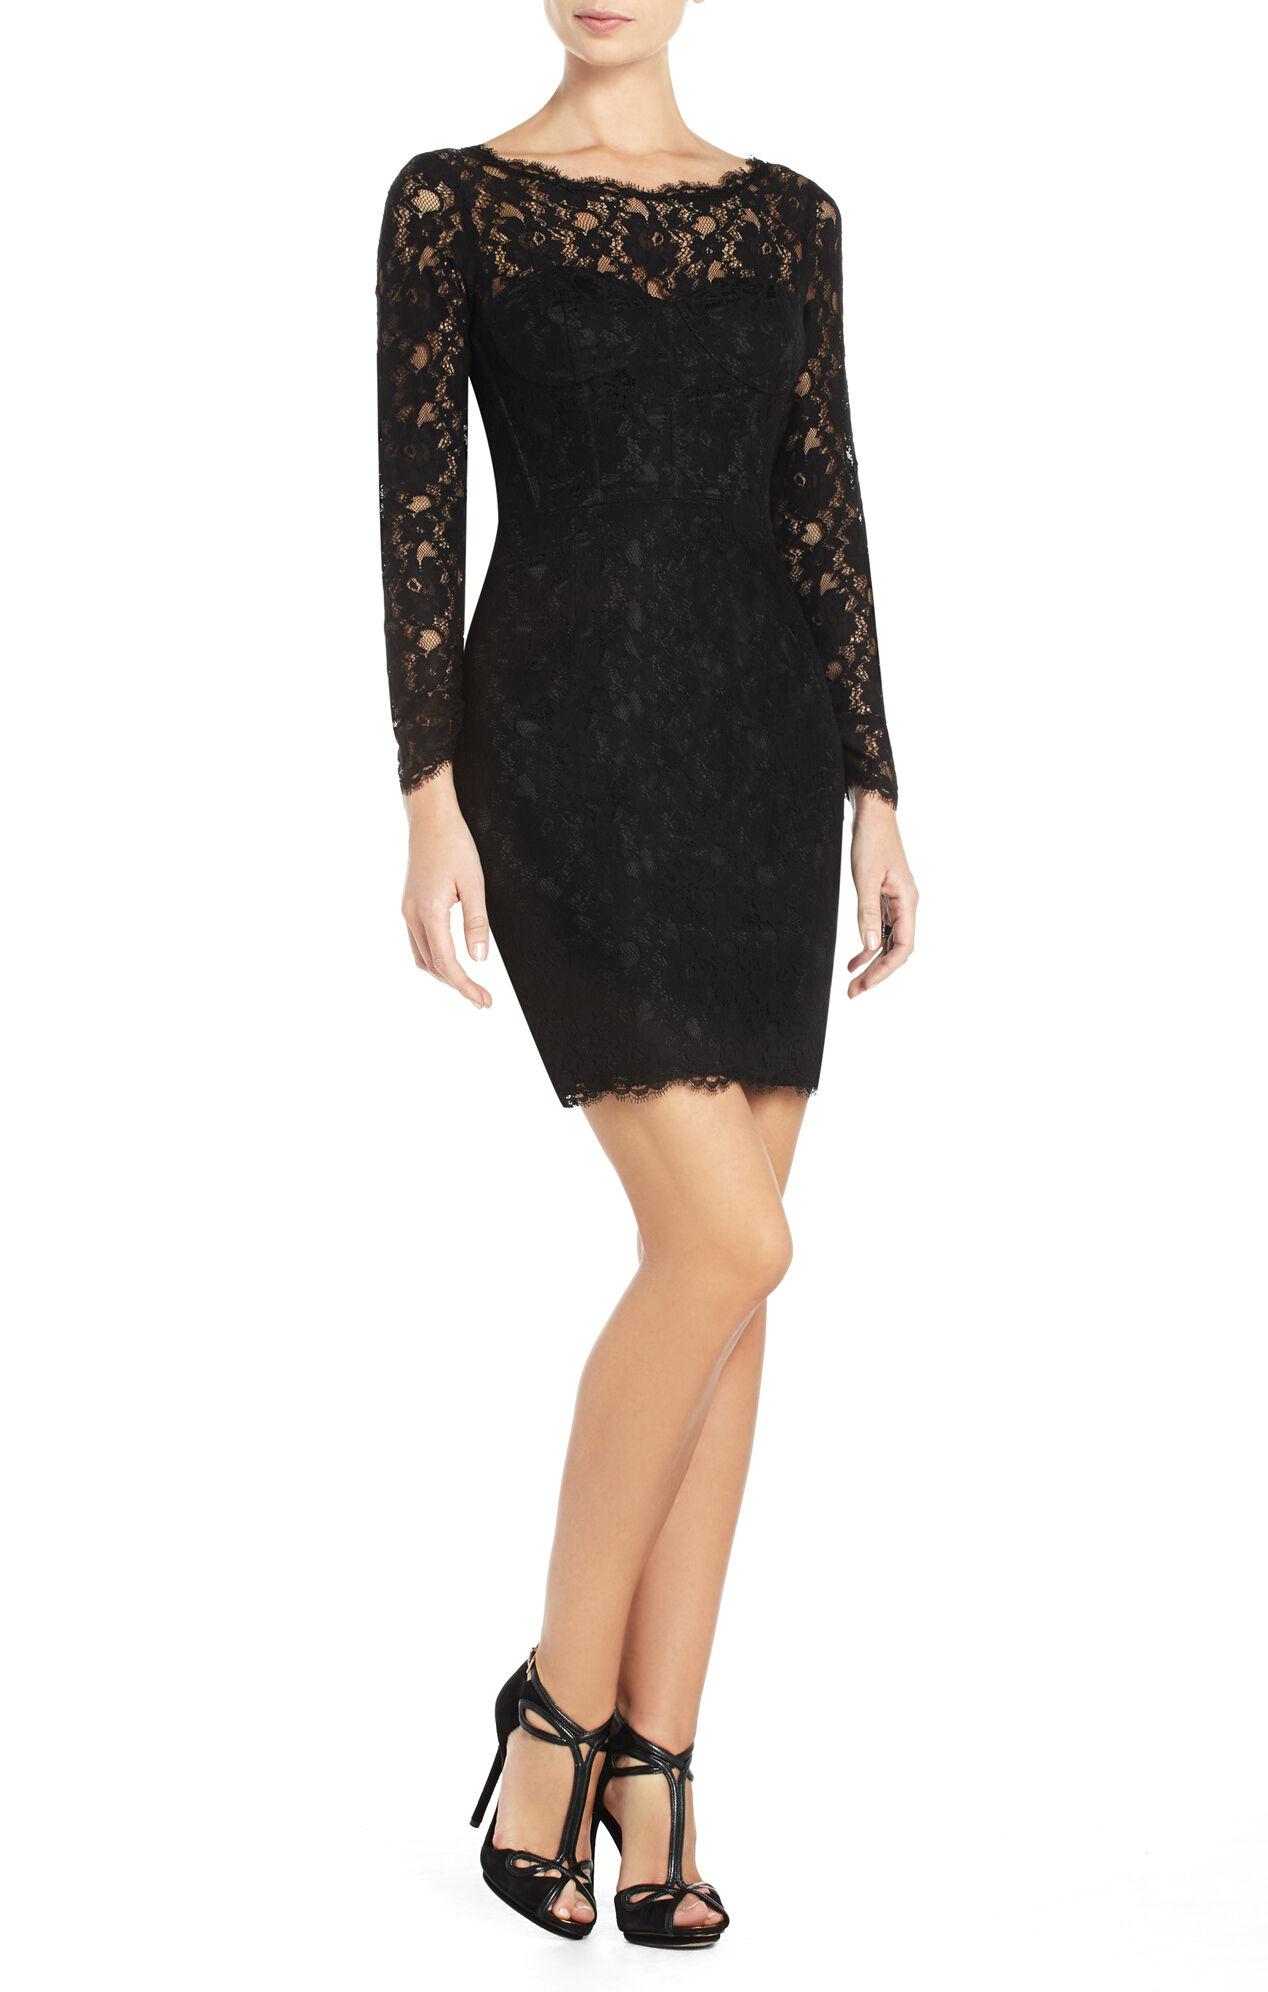 Arlena Lace Dress